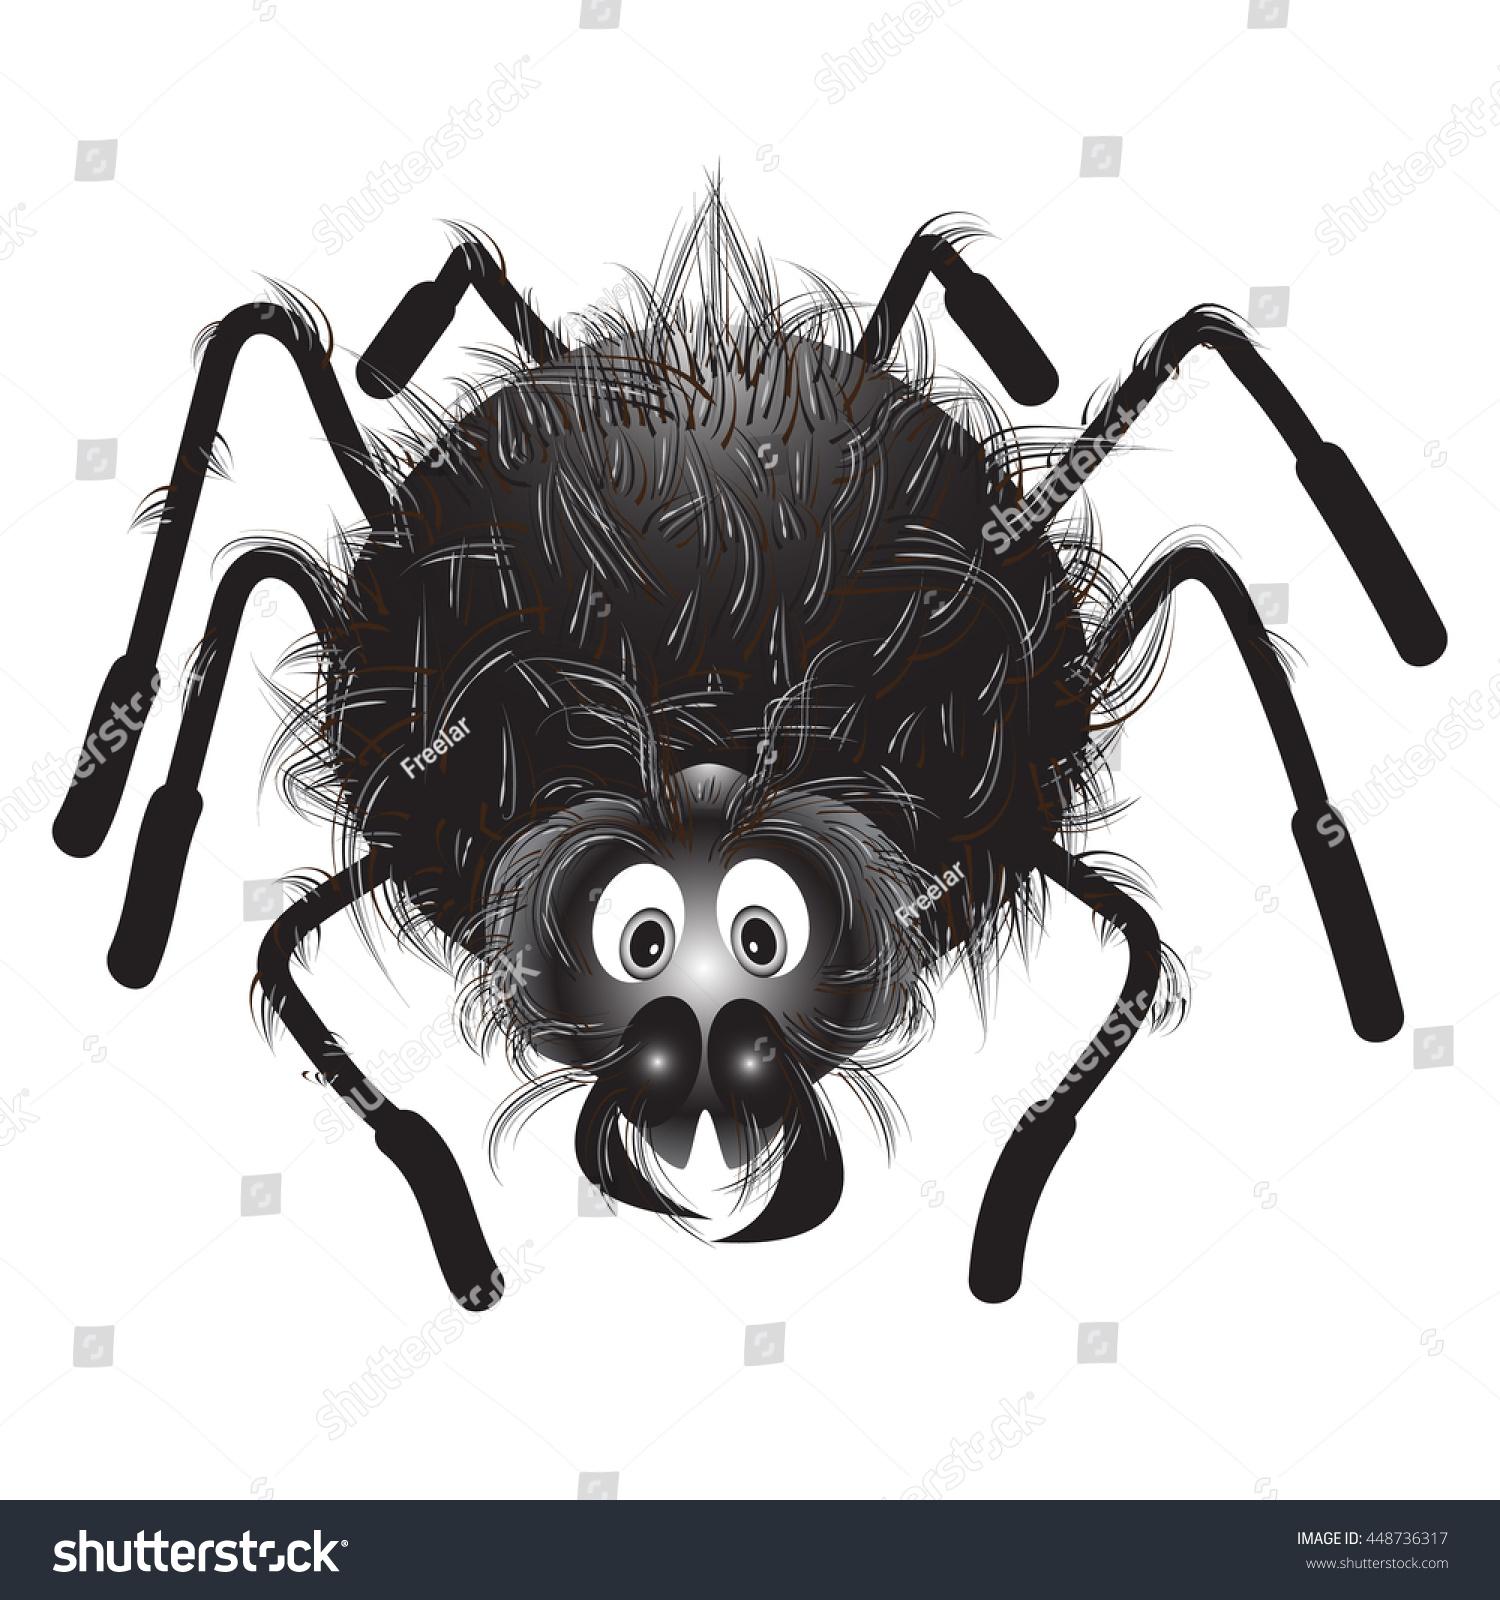 Fuzzy Black Background : Spiderfunny hairy black spider on white stock vector